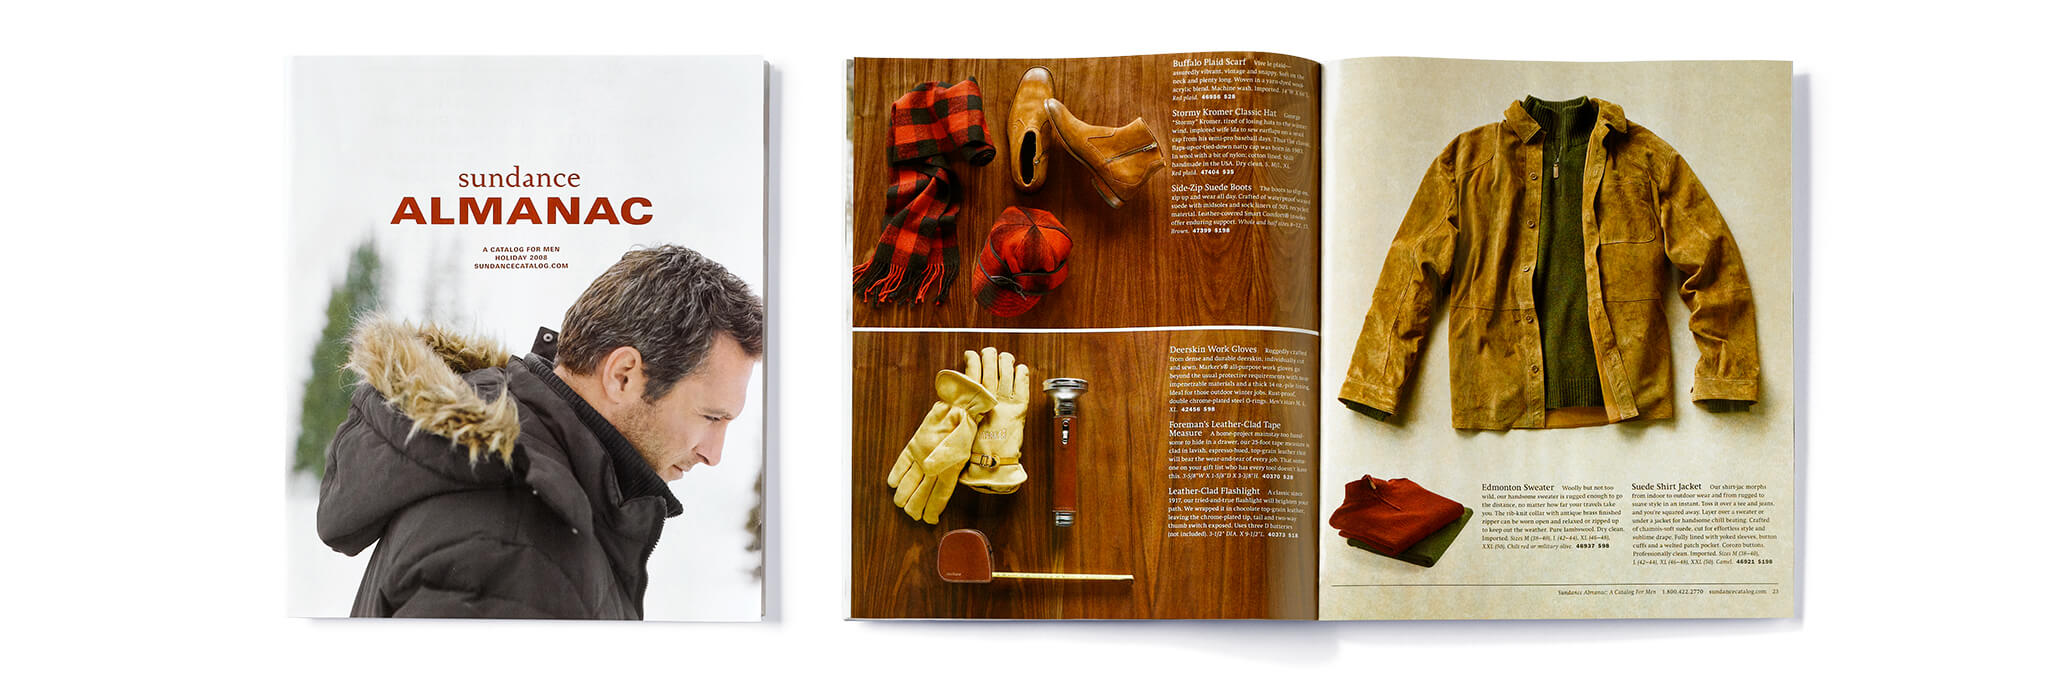 Sundance Almanac catalog cover and interior spread showing outerwear